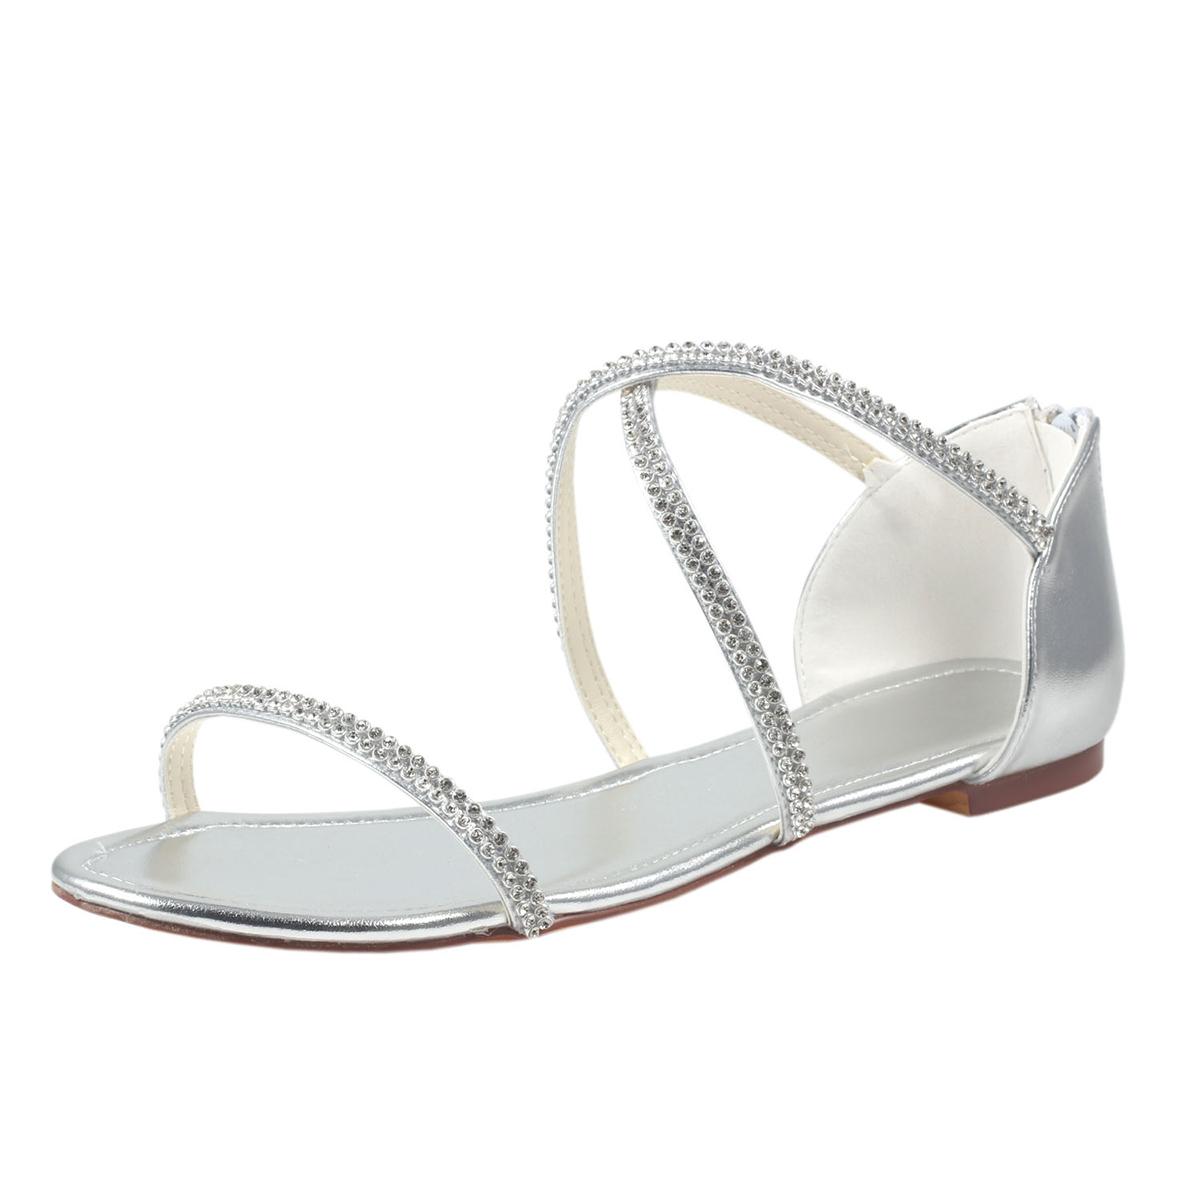 Flats Sandals Flat Heel Patent Leather Wedding Shoes With Rhinestone Zipper